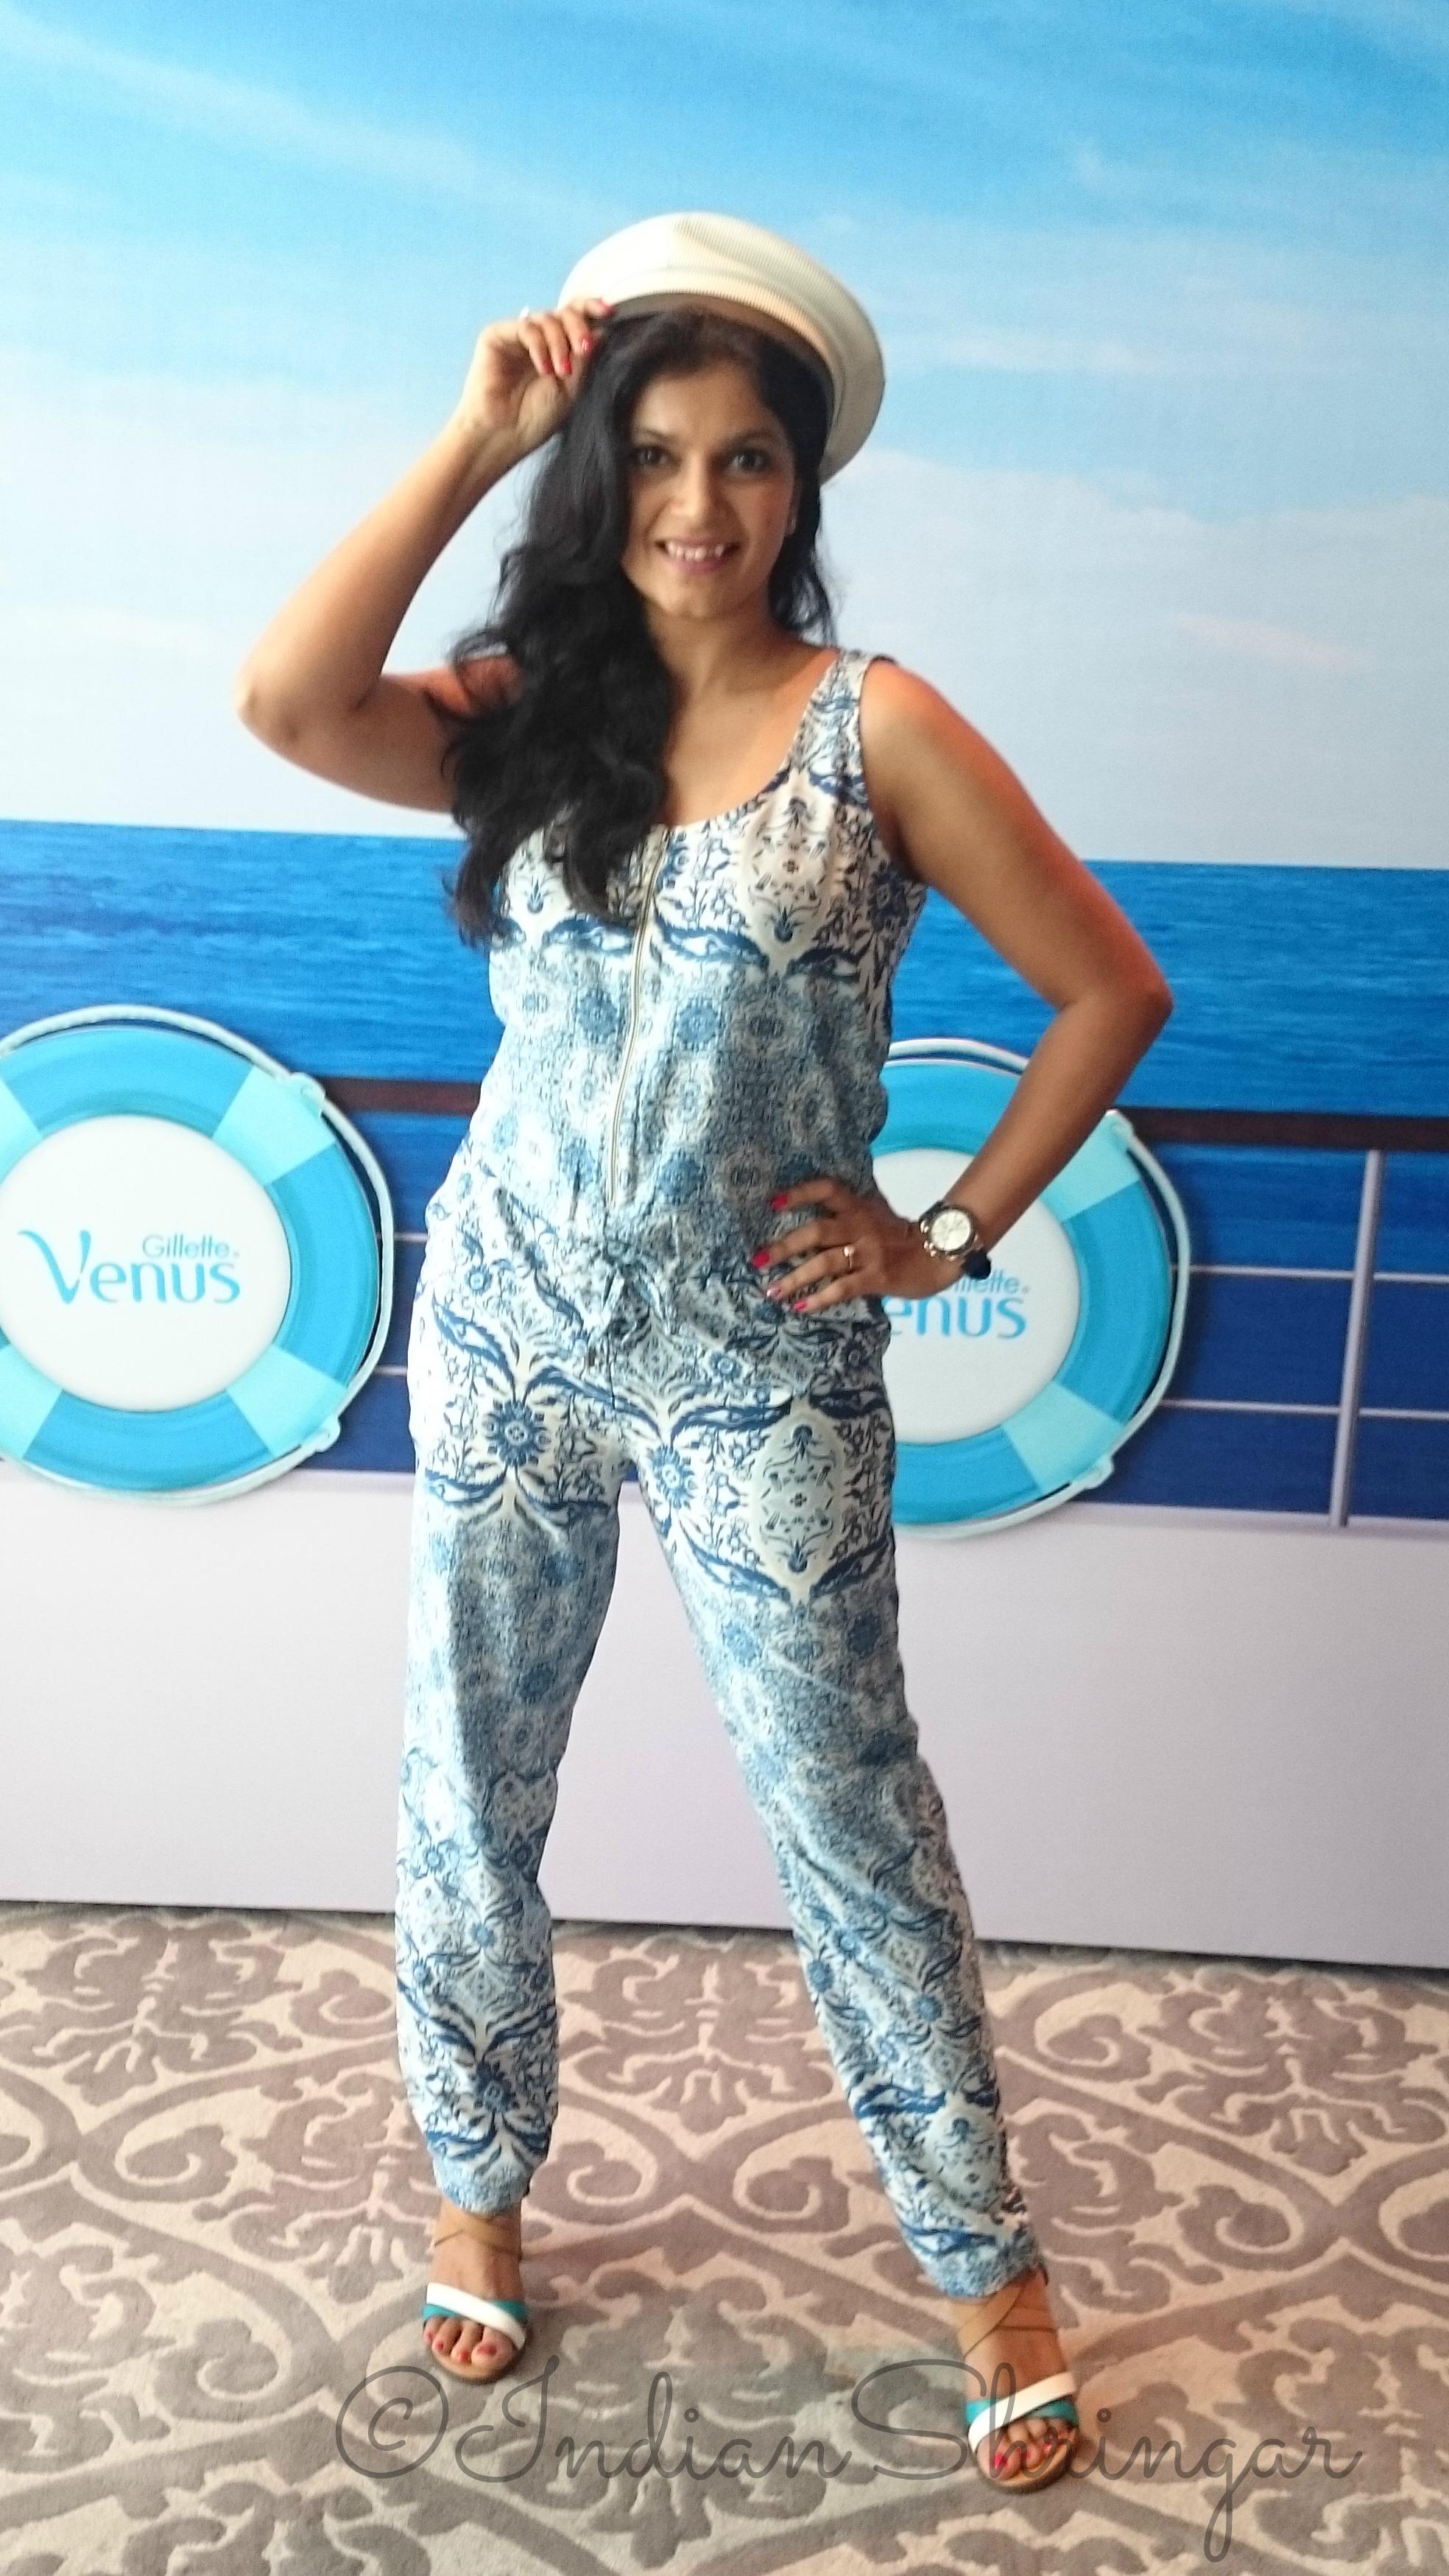 Gillette Venus Blogger Meet